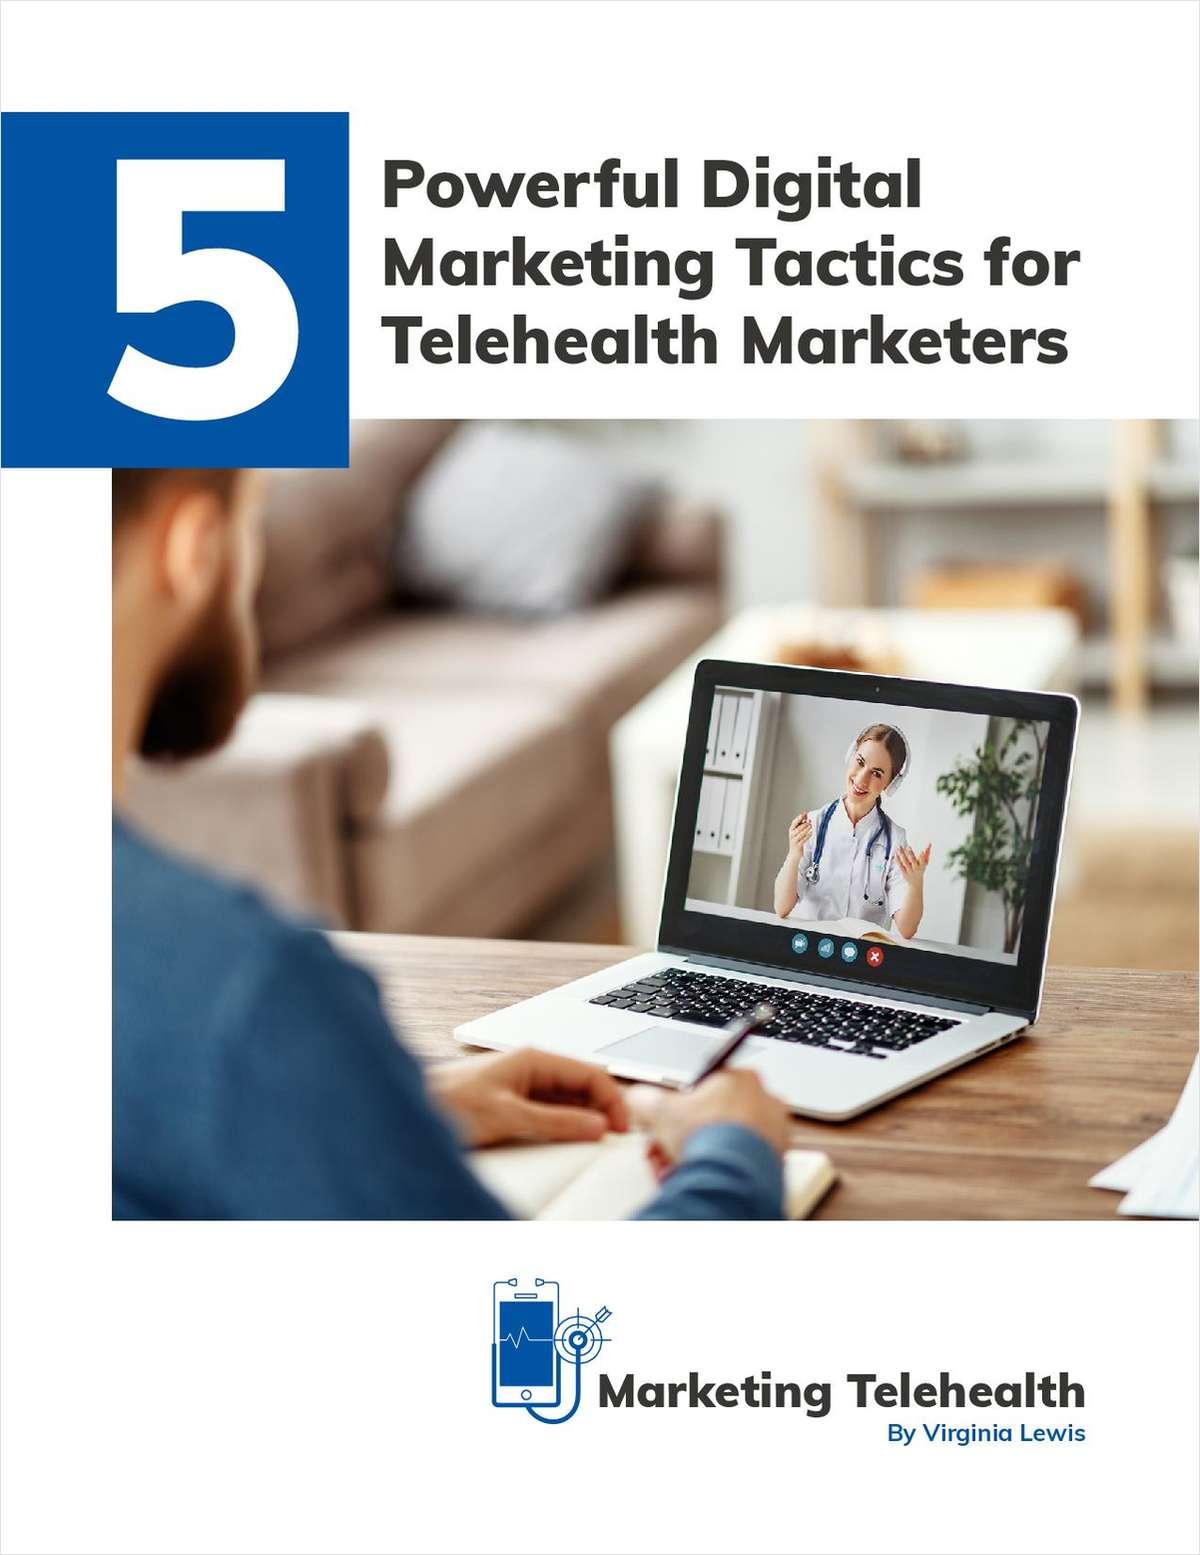 5 Powerful Digital Marketing Tactics for Telehealth Marketers